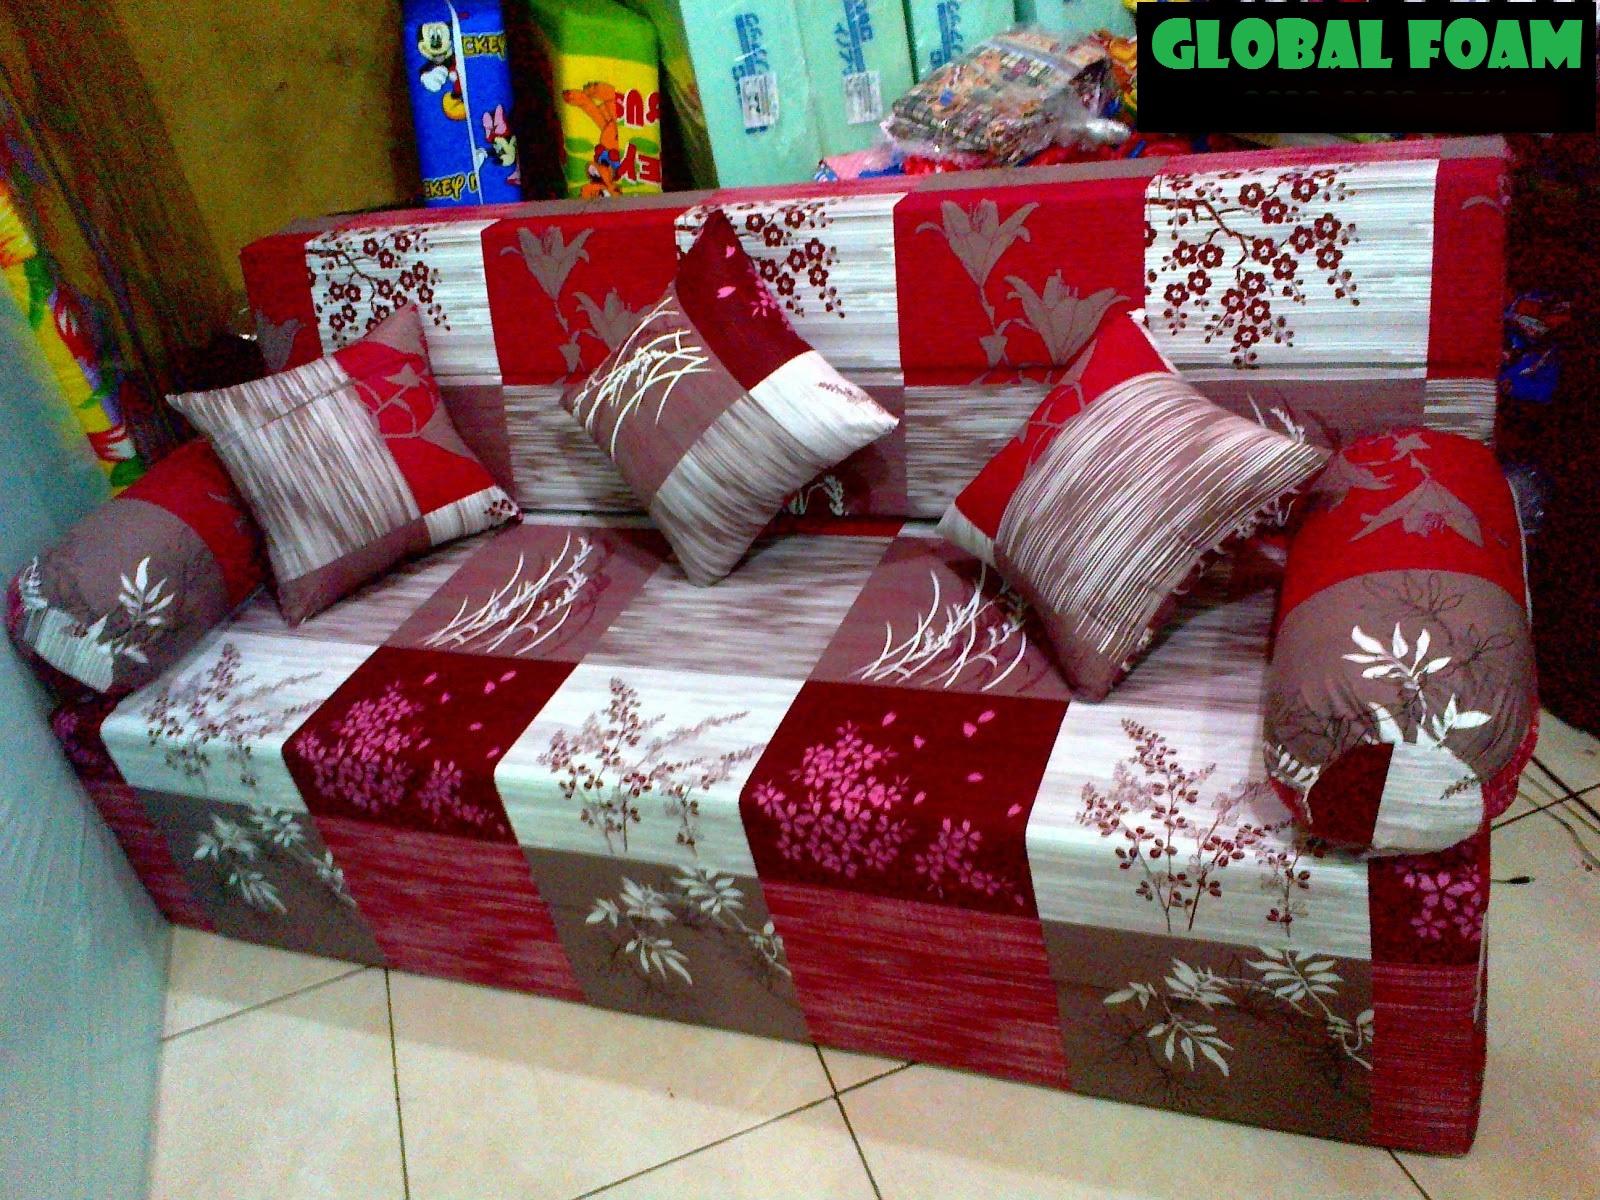 harga cover sofa bed inoac gregory sectional rooms to go kasur distributor dan agen resmi busa